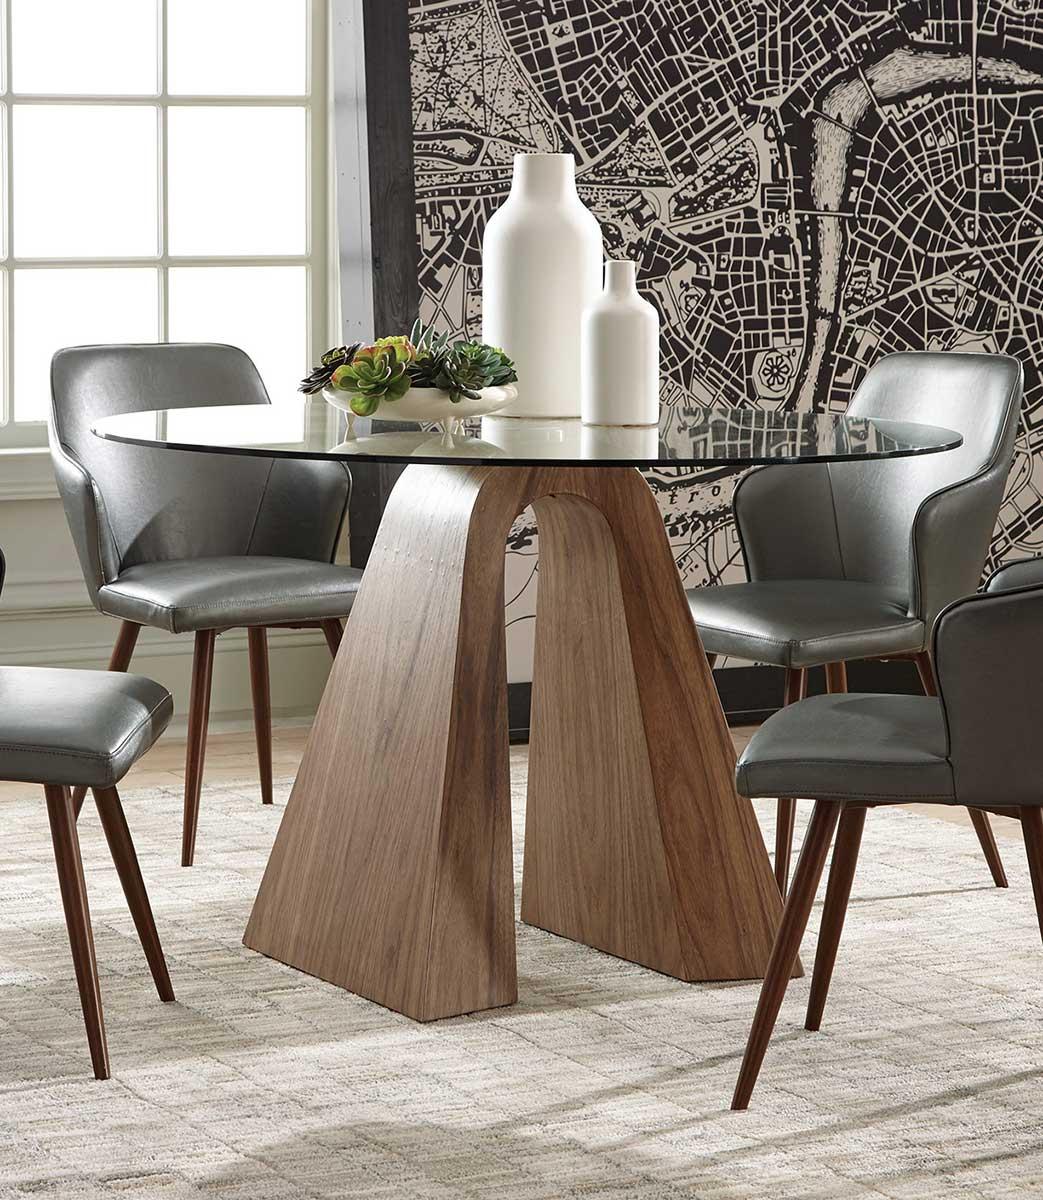 Coaster Abbott Dining Table - Walnut/Metallic Grey